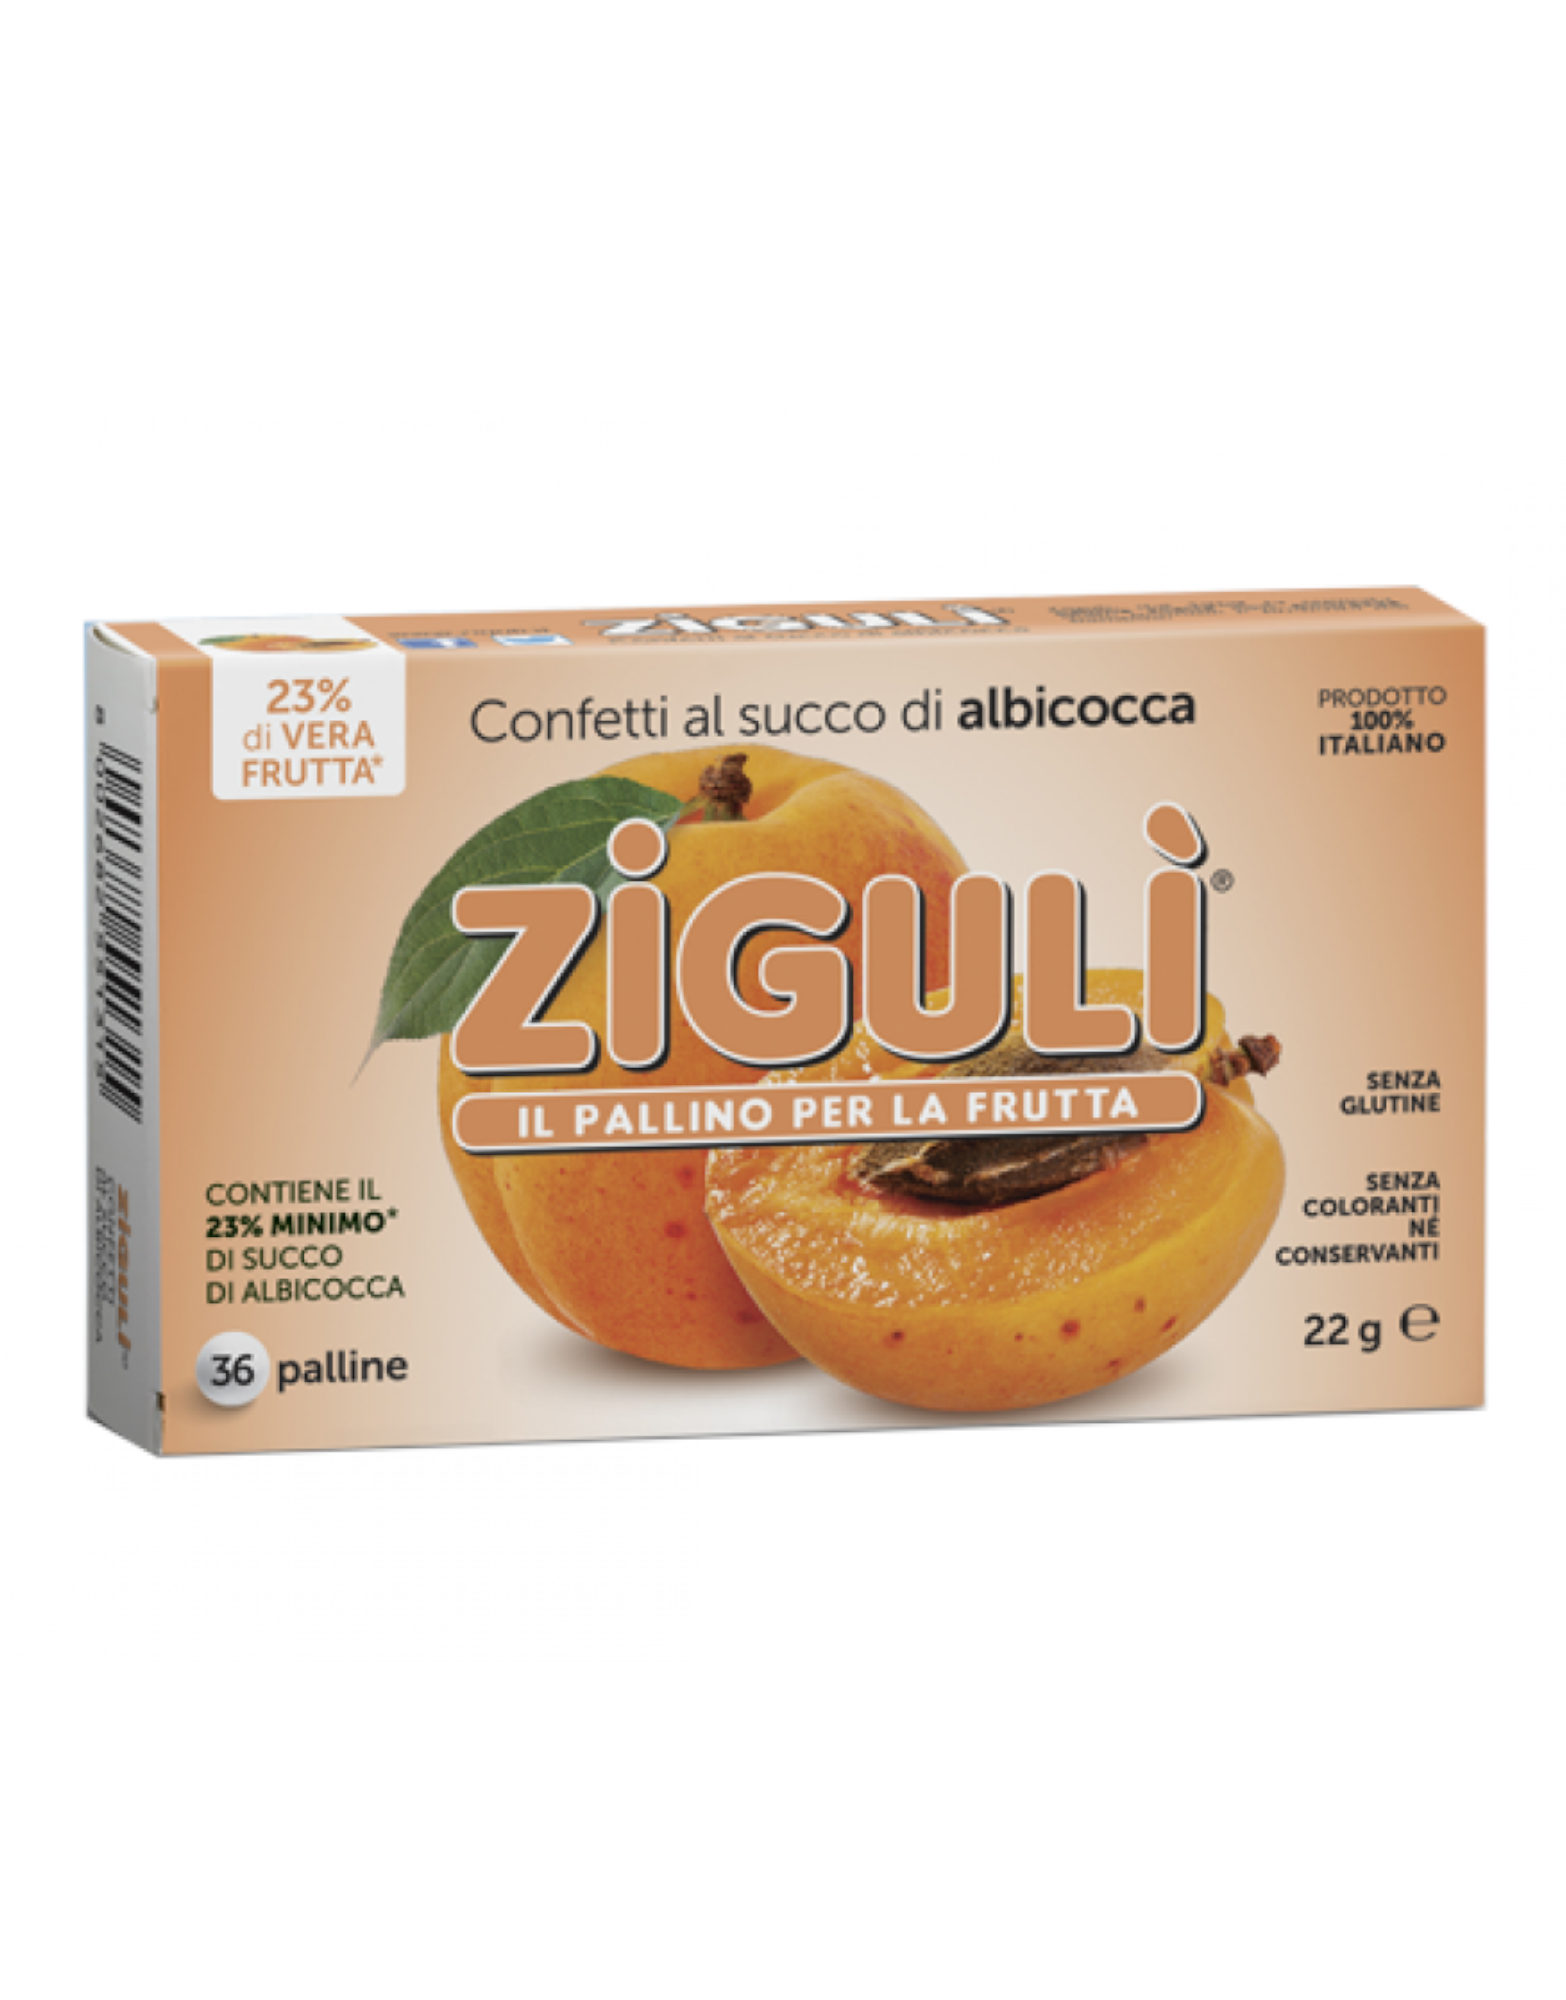 Zigulì Confetti Al Succo Di Albicocca By Zigulì Iafstore Com